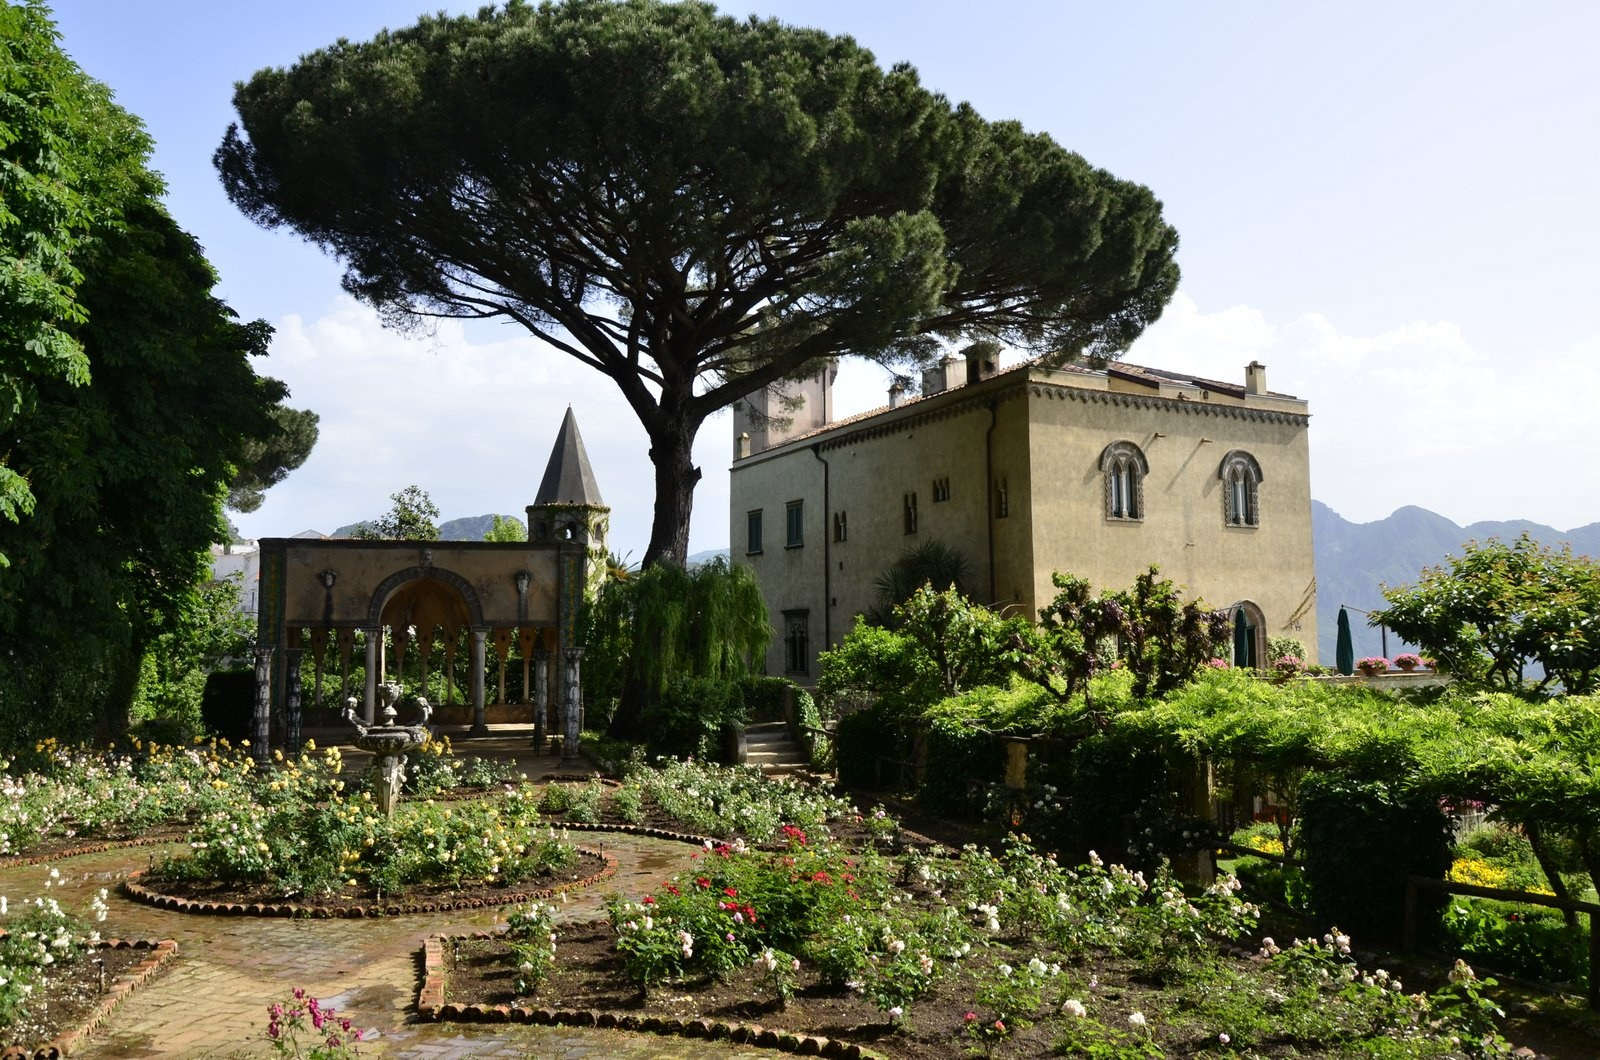 Villa Cimbrone a Ravello (Campania)